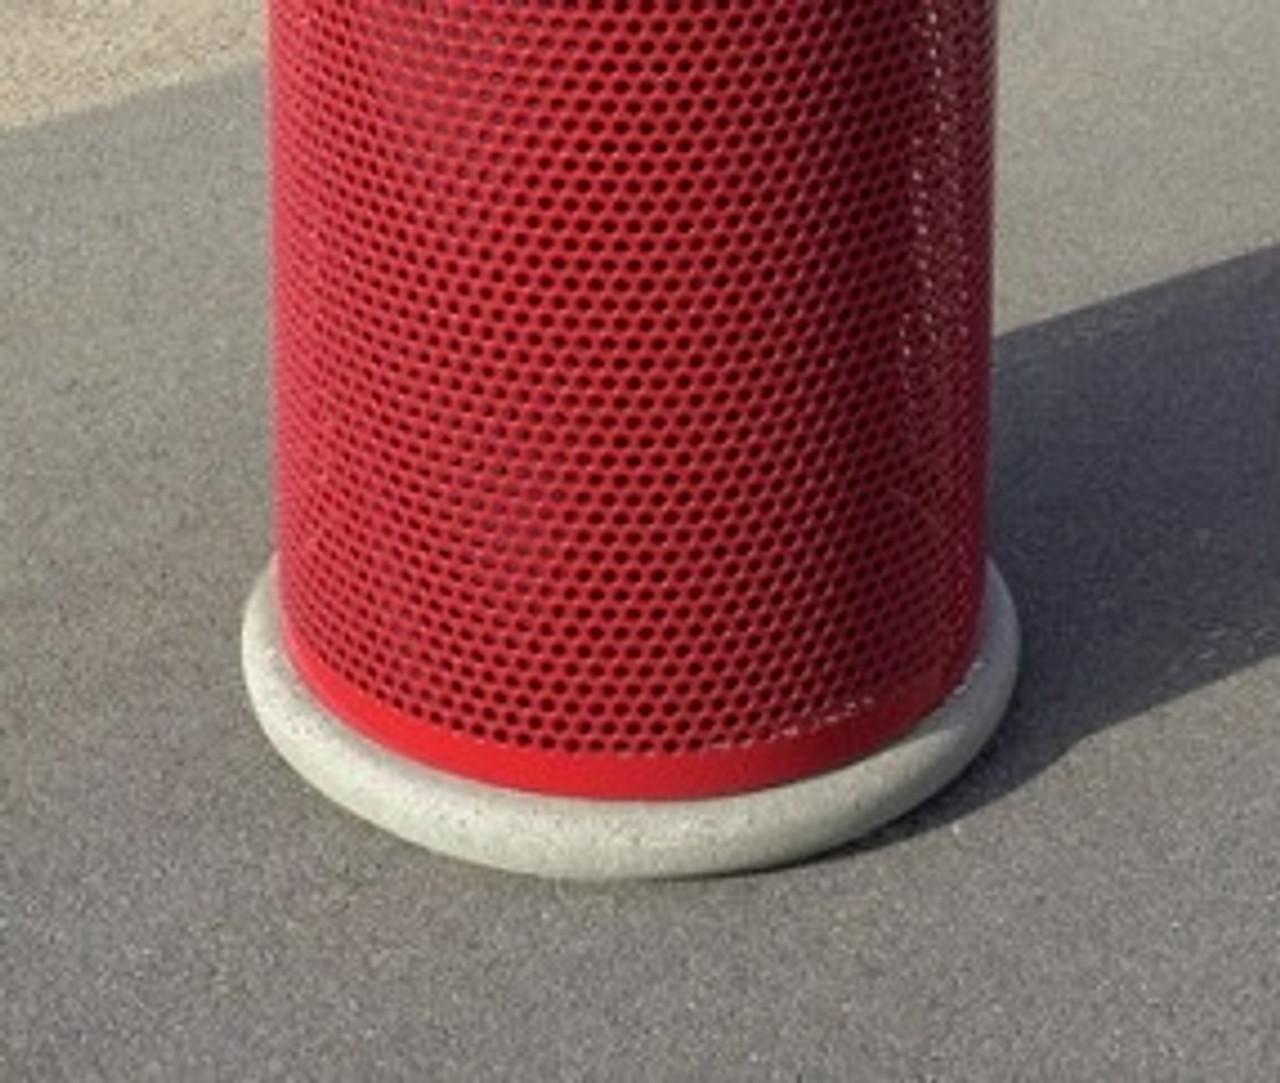 Optional Concrete Base